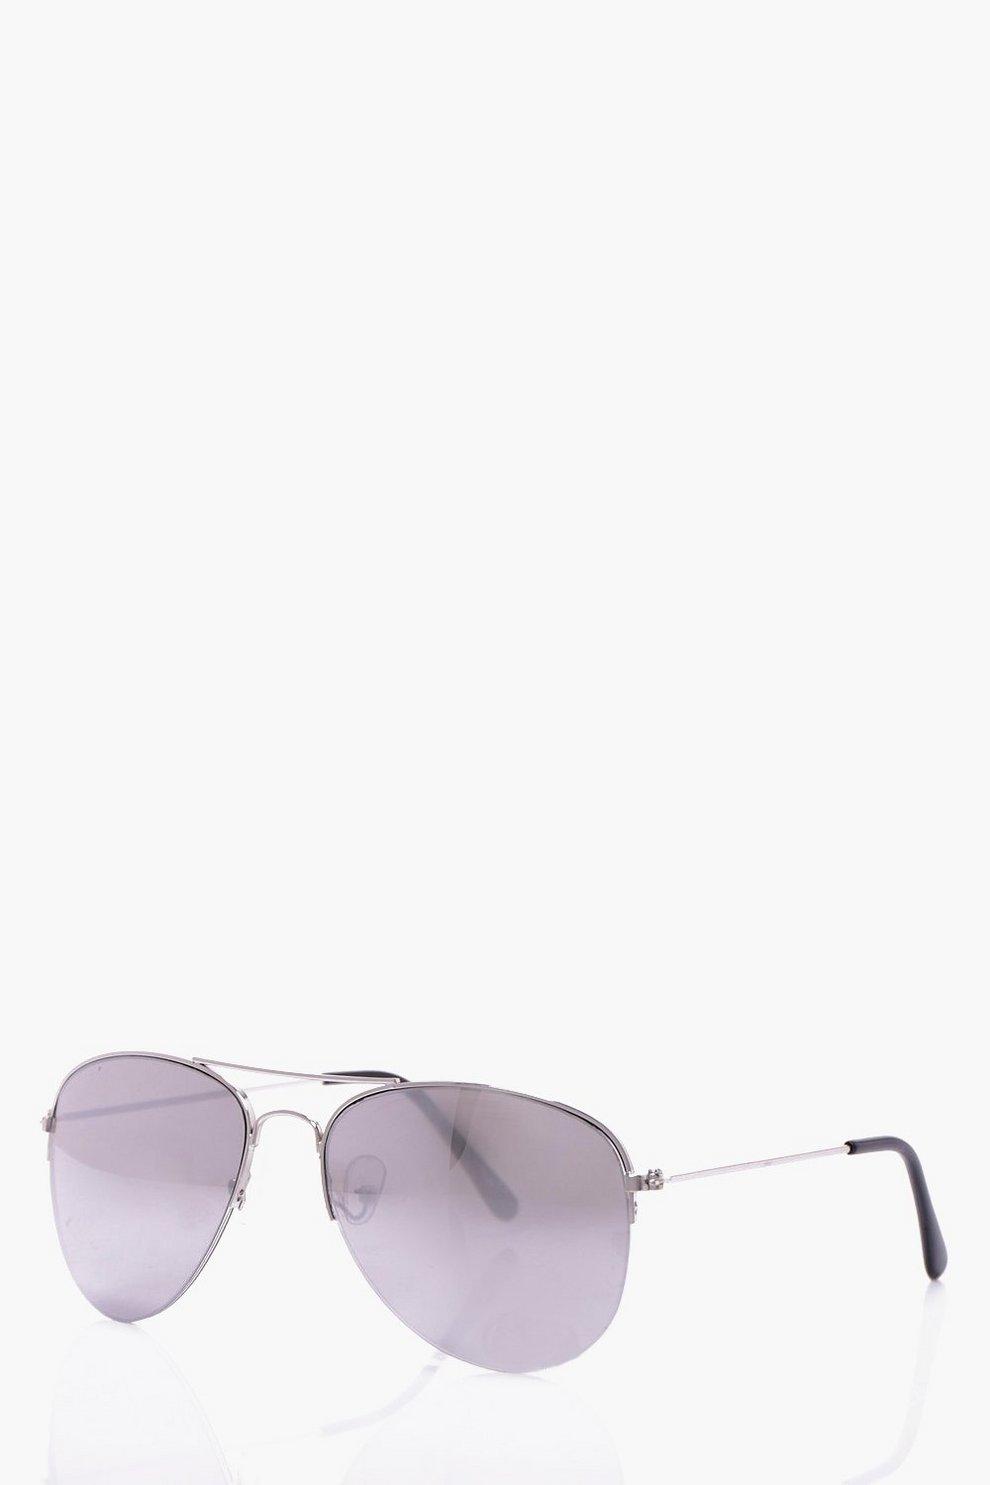 ee1ef22840 Silver Frame Classic Aviator Sunglasses